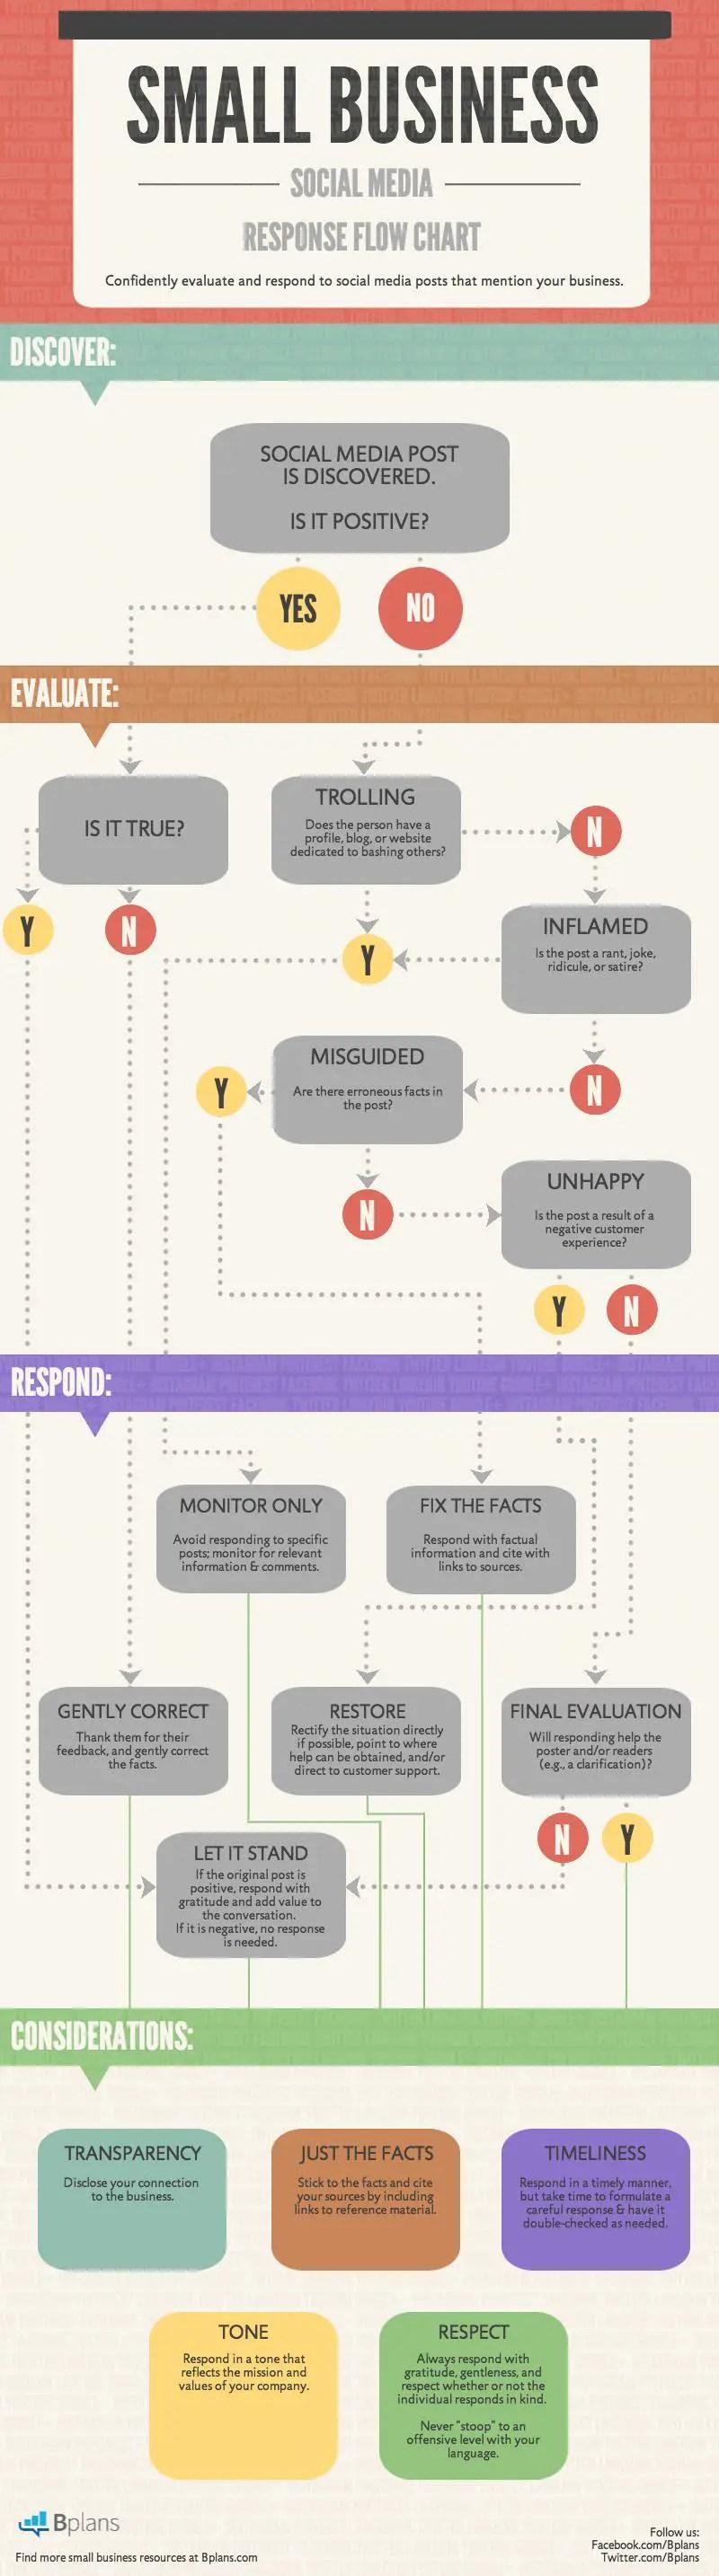 wersm-bplan-Social-Media-Response-Tree-decision-infographic